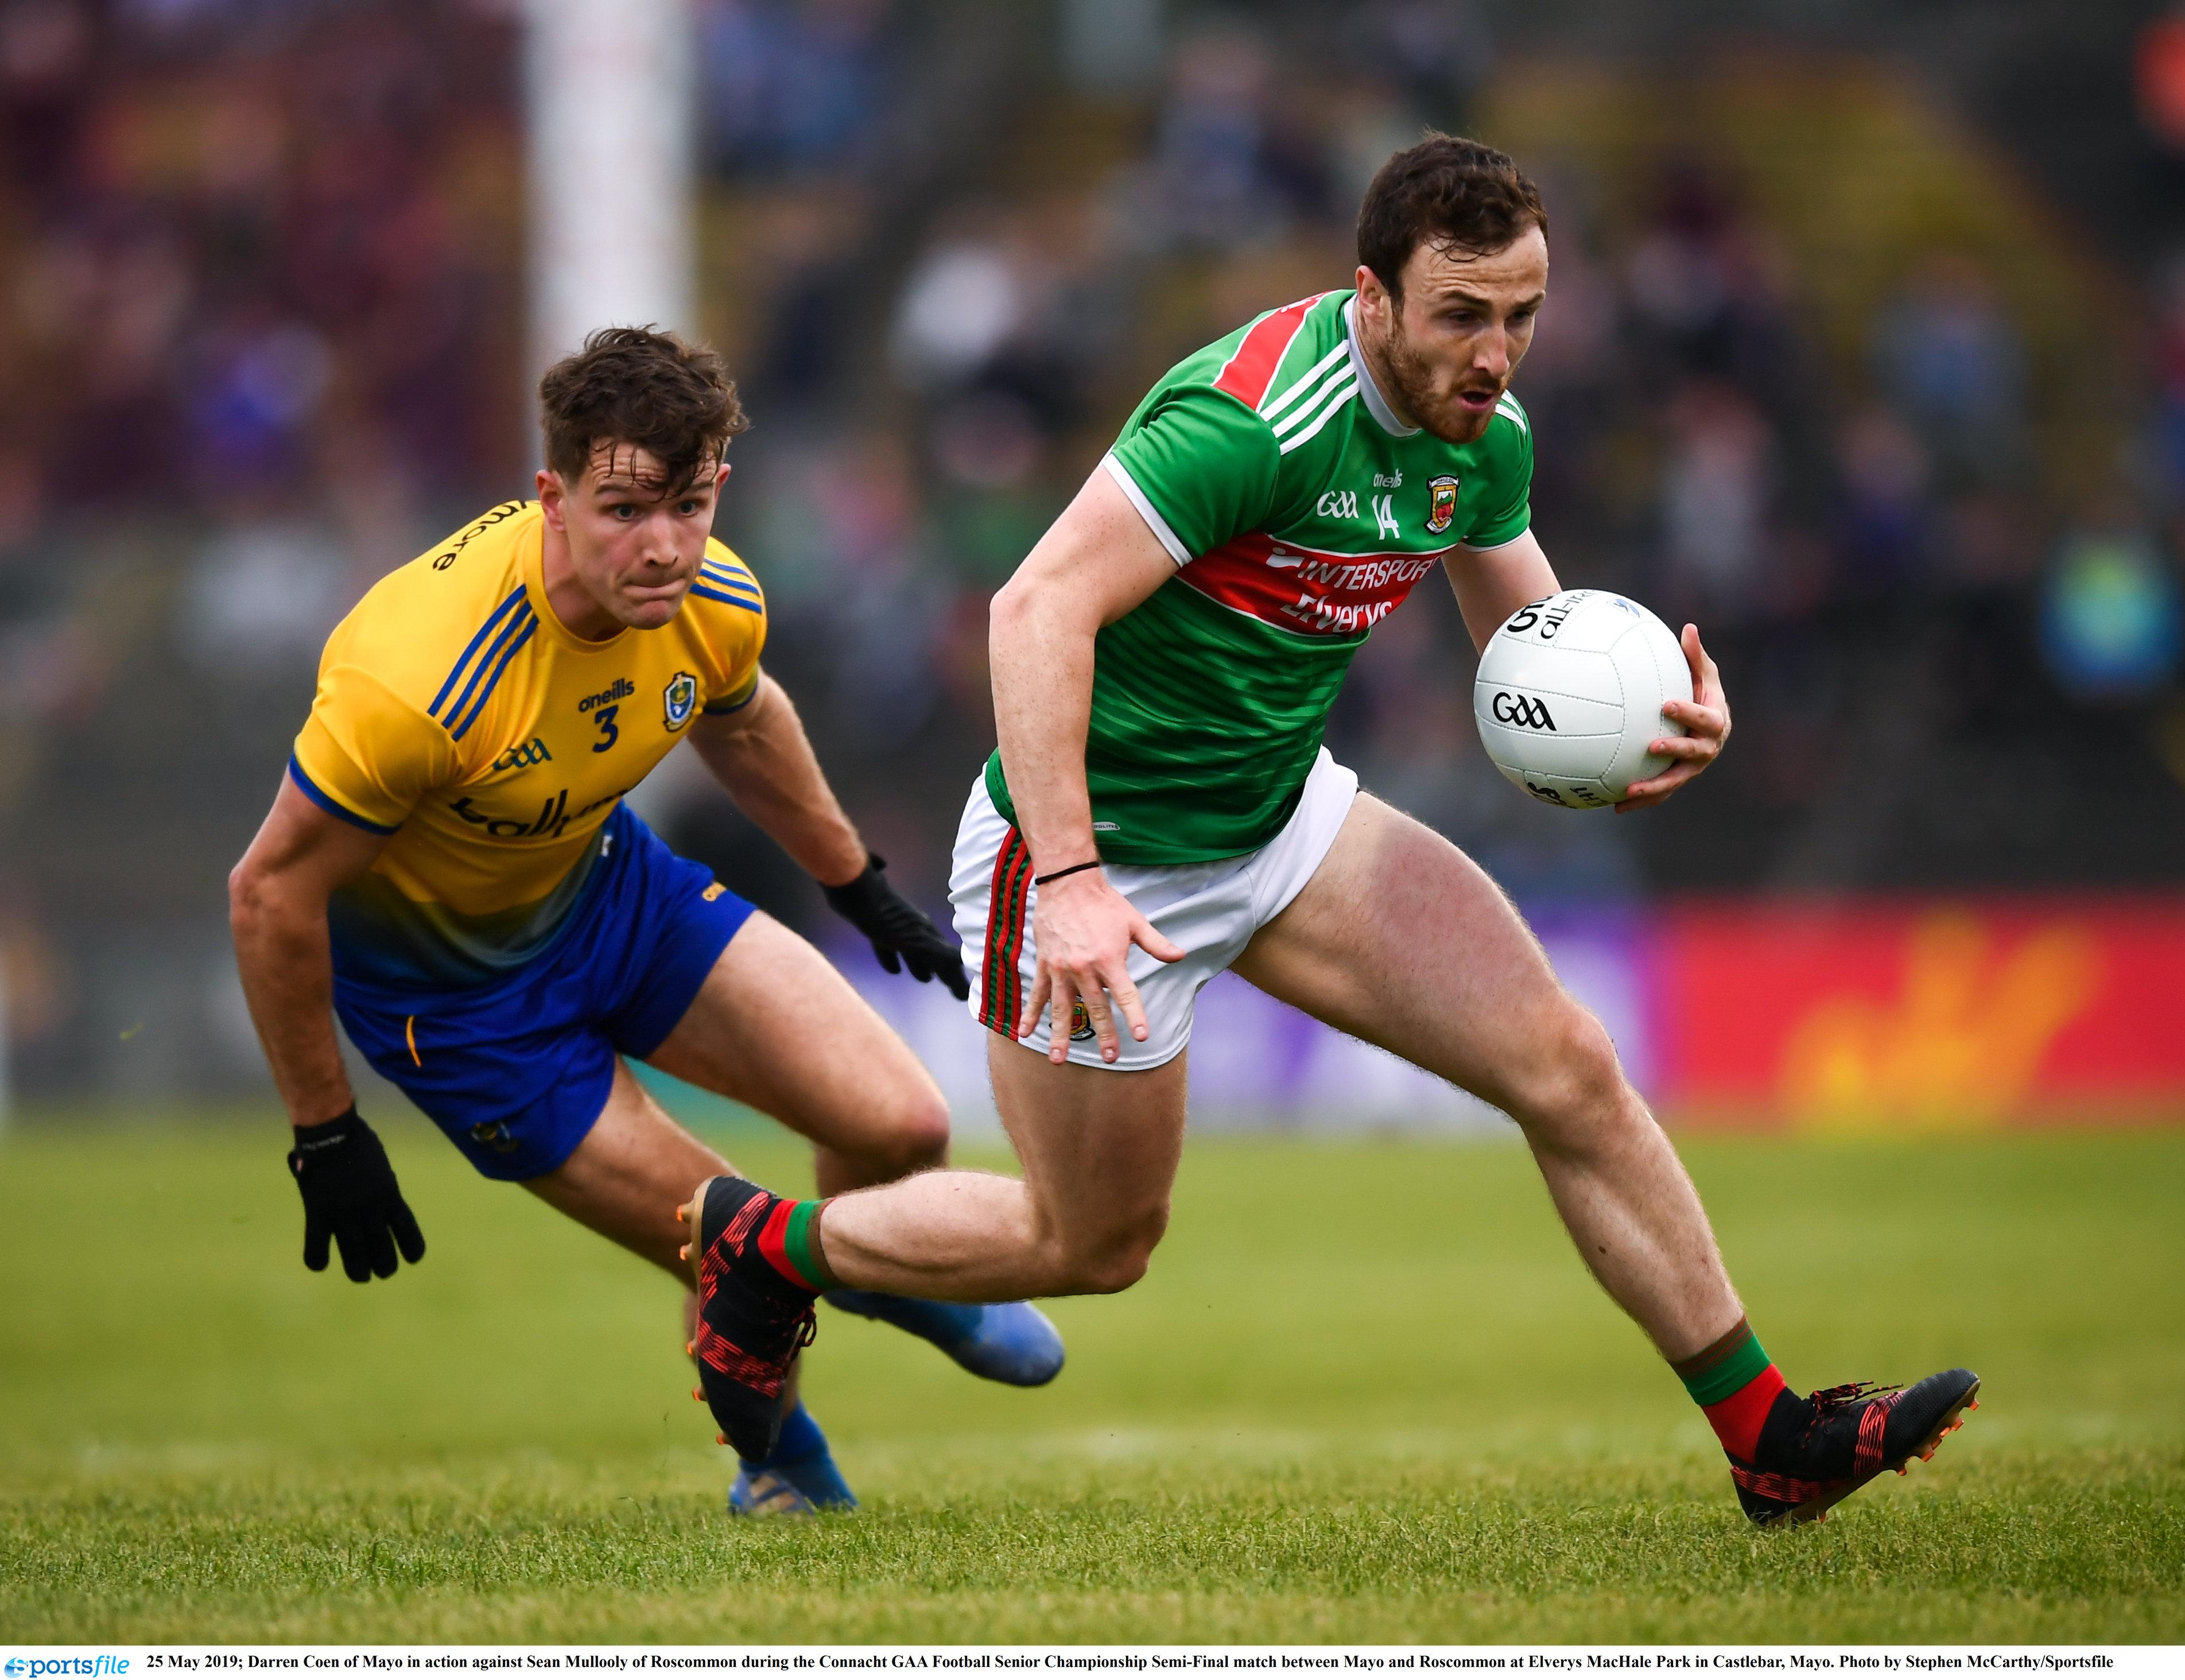 Roscommon Come Through Ferocious Battle in MacHale Park to Reach Connacht Final